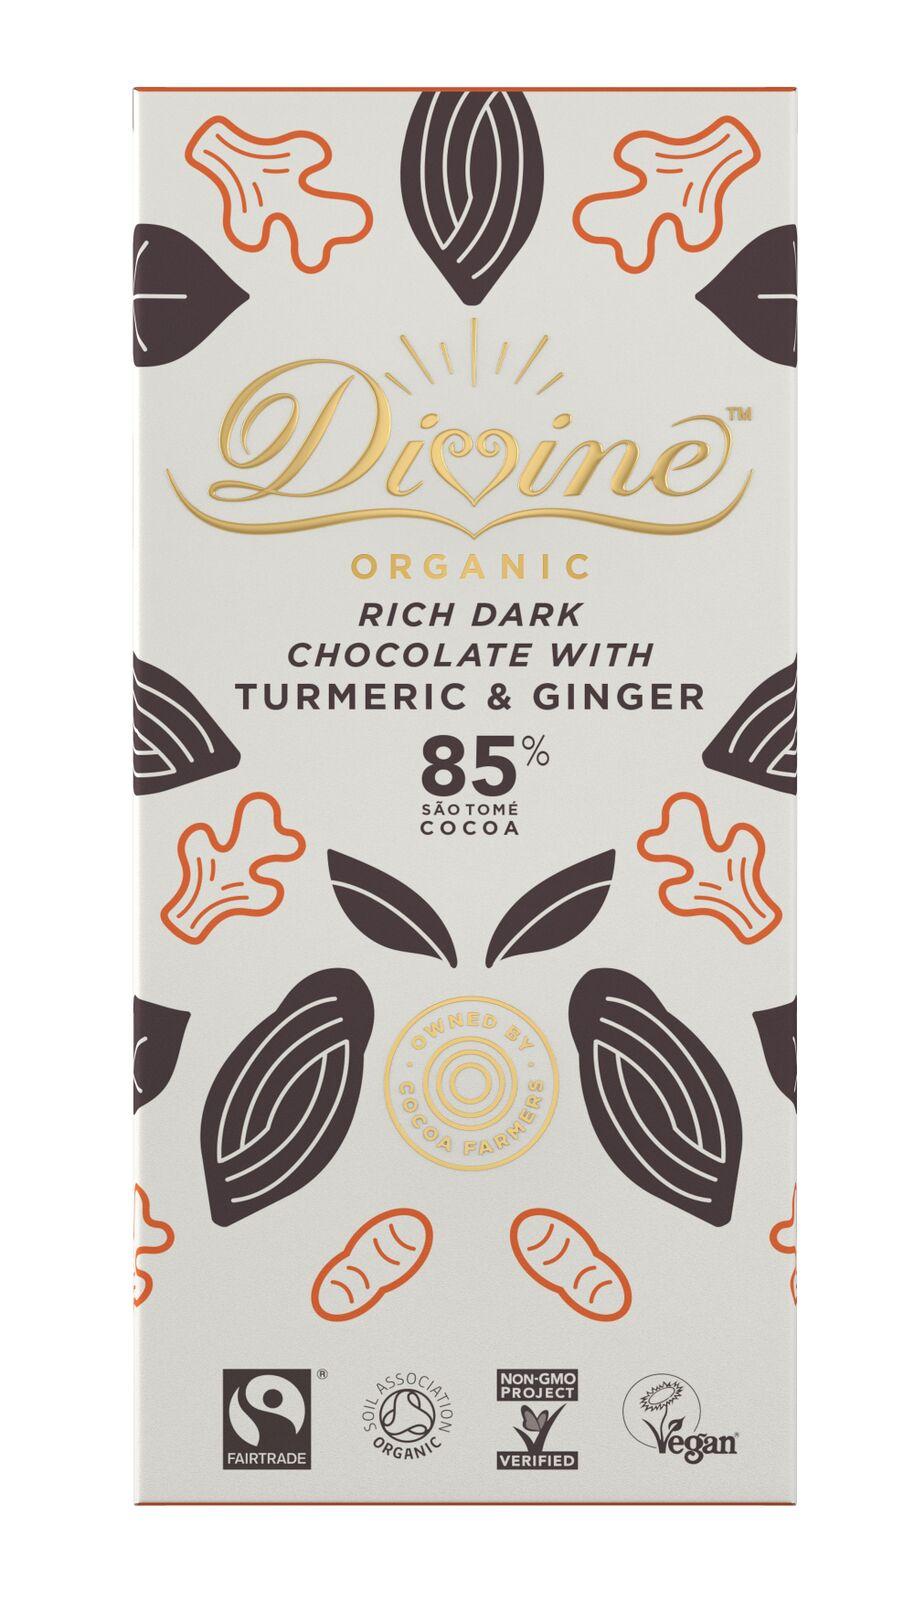 Organic, 85% with Turmeric & Ginger